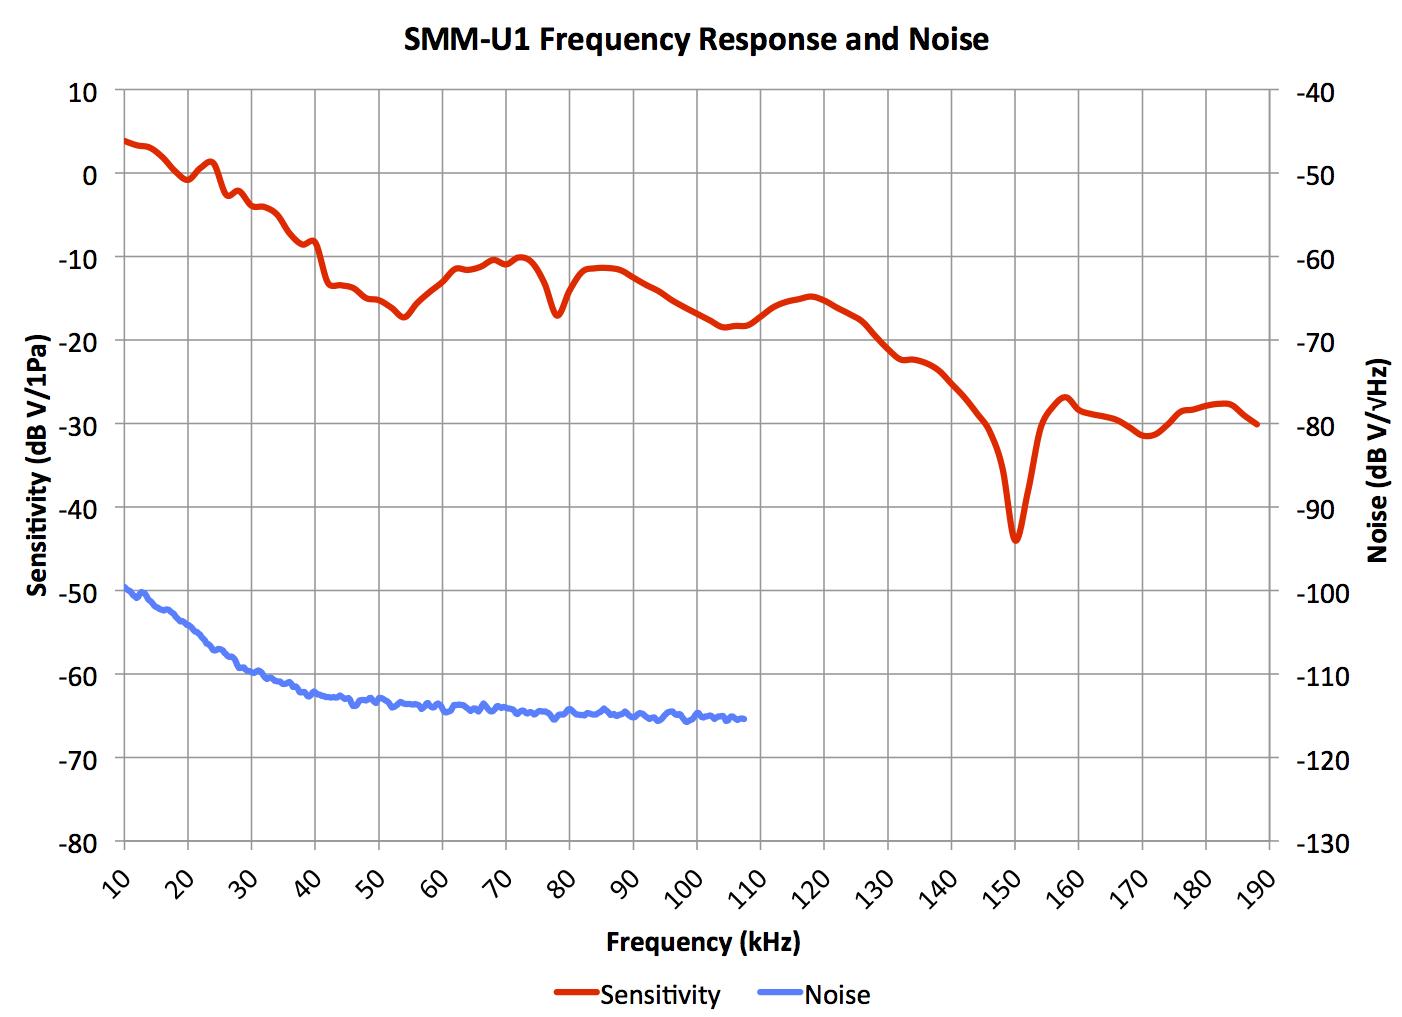 SMM-U1